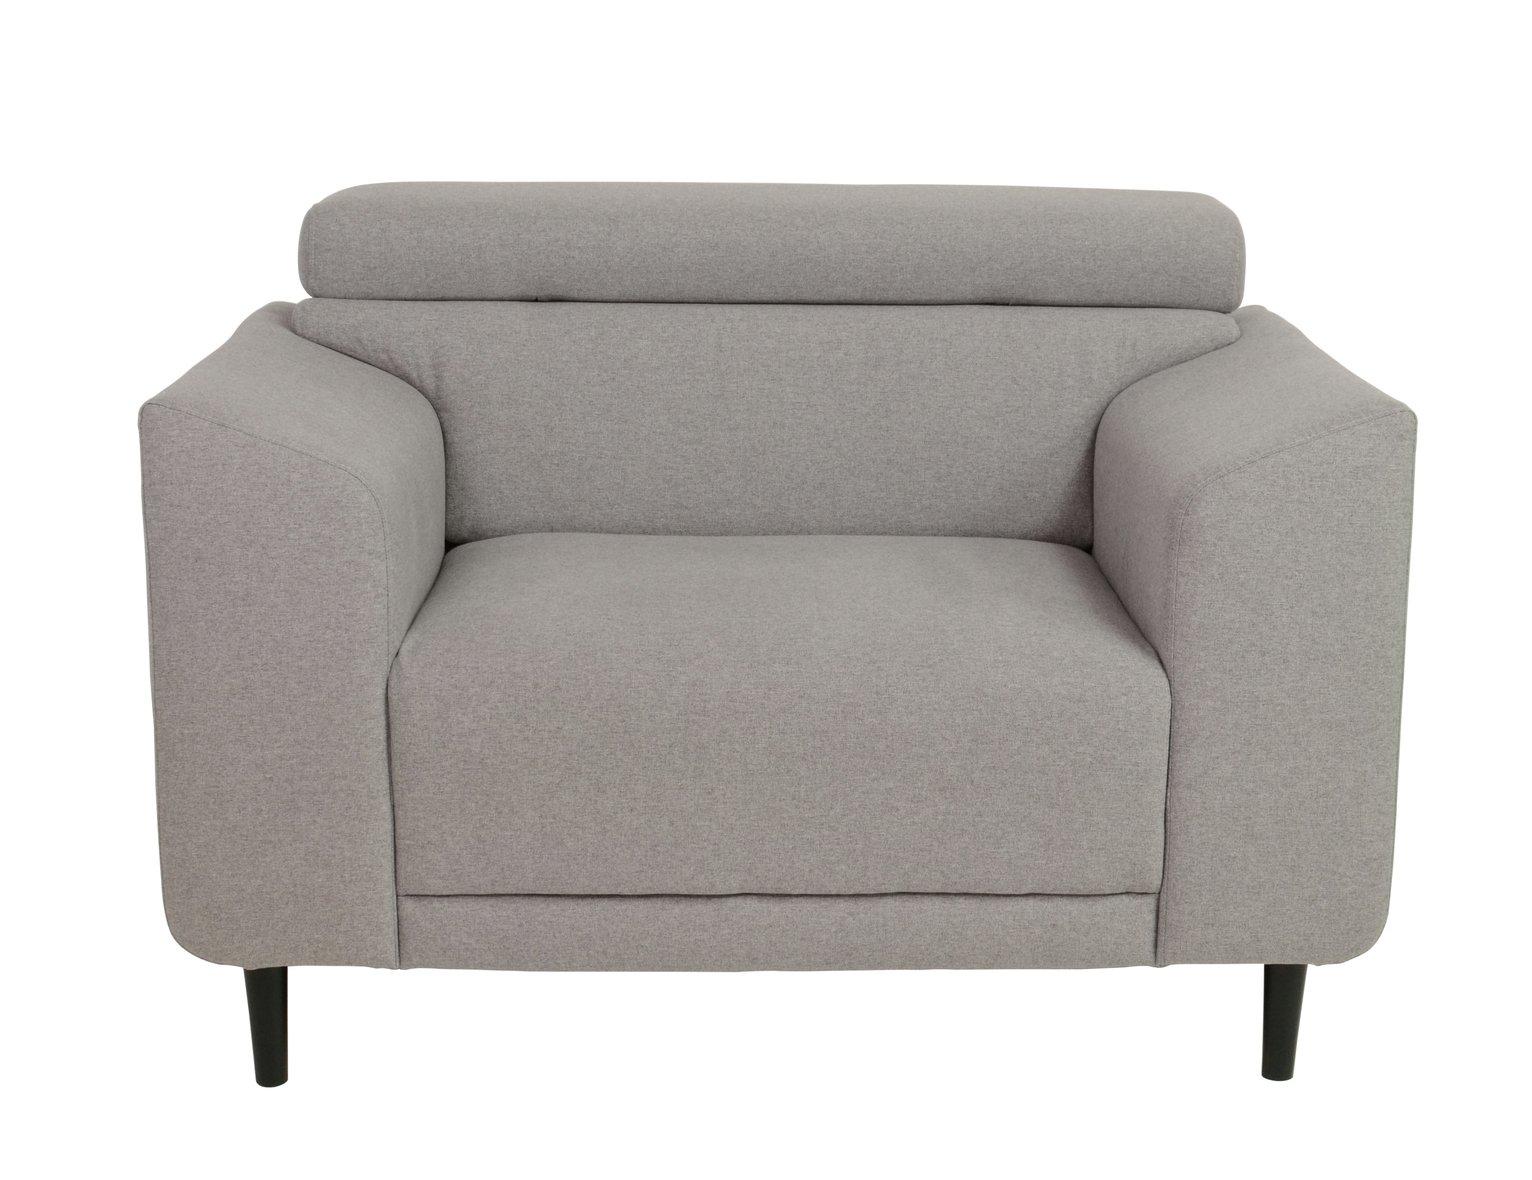 Argos Home Jonas Fabric Armchair - Light Grey